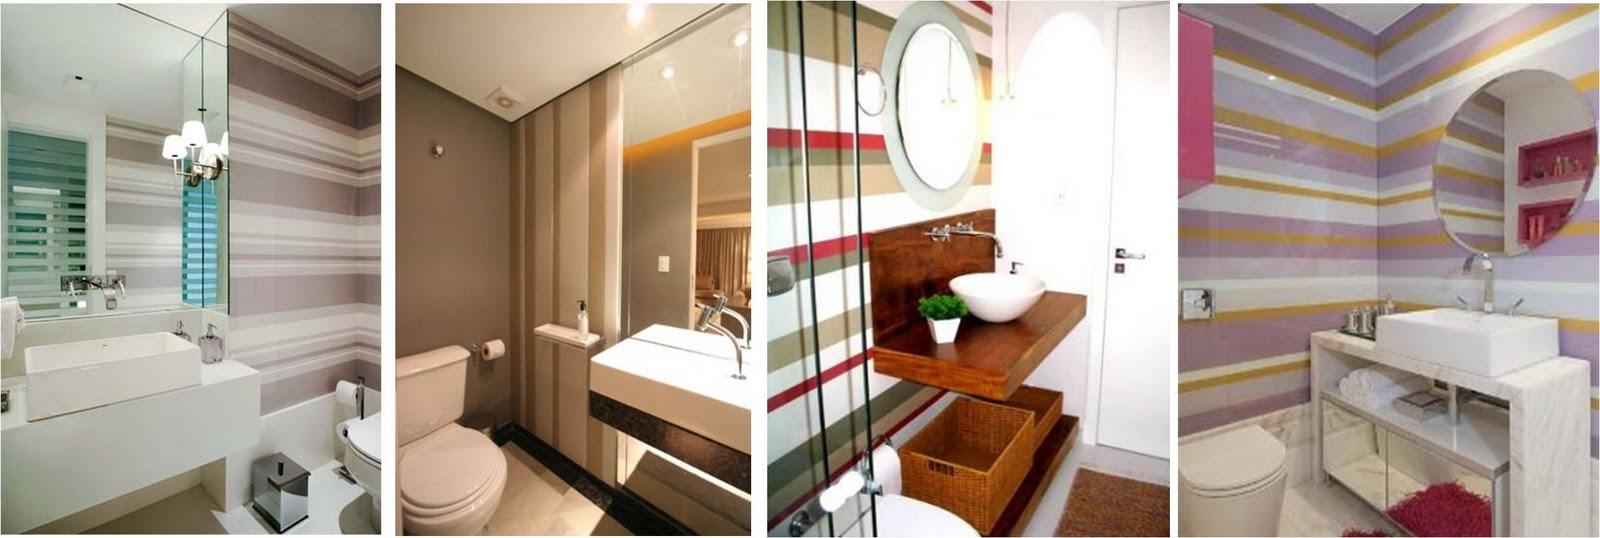 decoracao lavabo papel de parede : decoracao lavabo papel de parede: de interiores e tendências 2012. dicas de: Lavabos: papel de parede